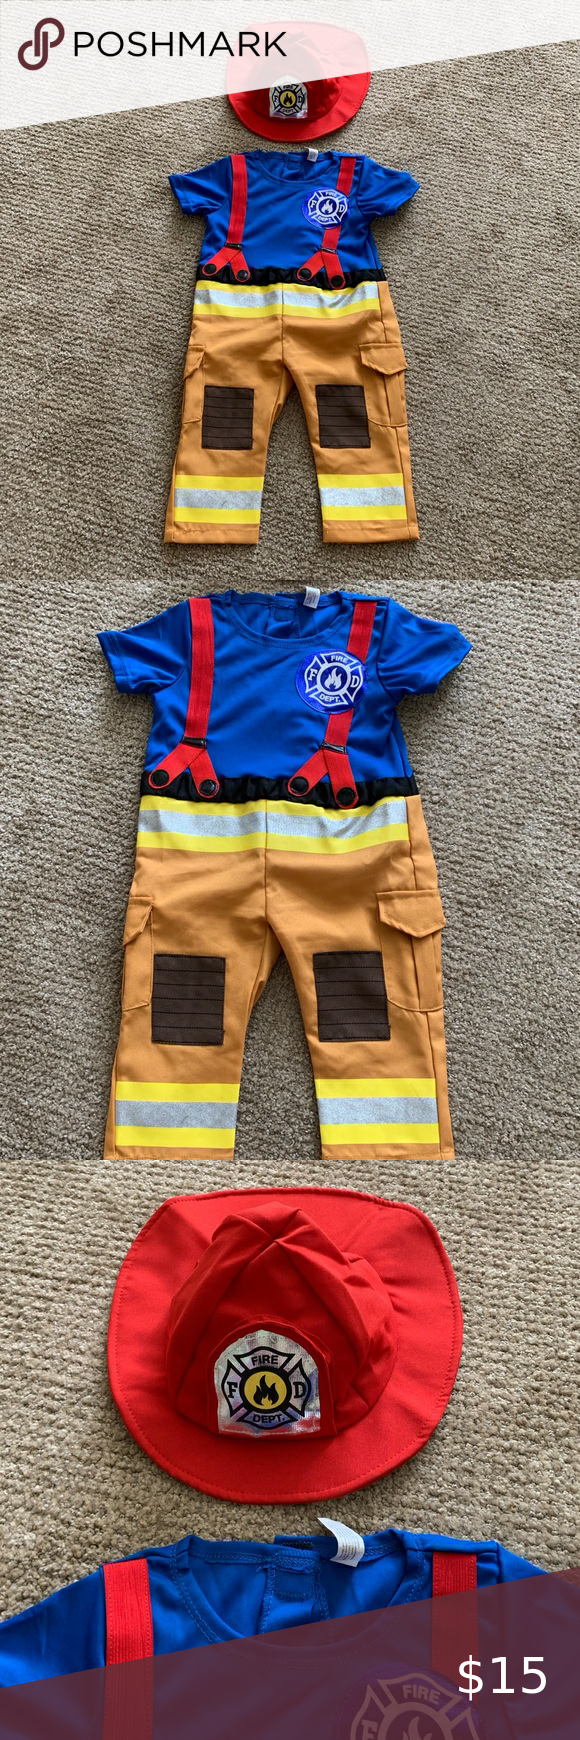 Firefighter Halloween Costume in 2020 Firefighter